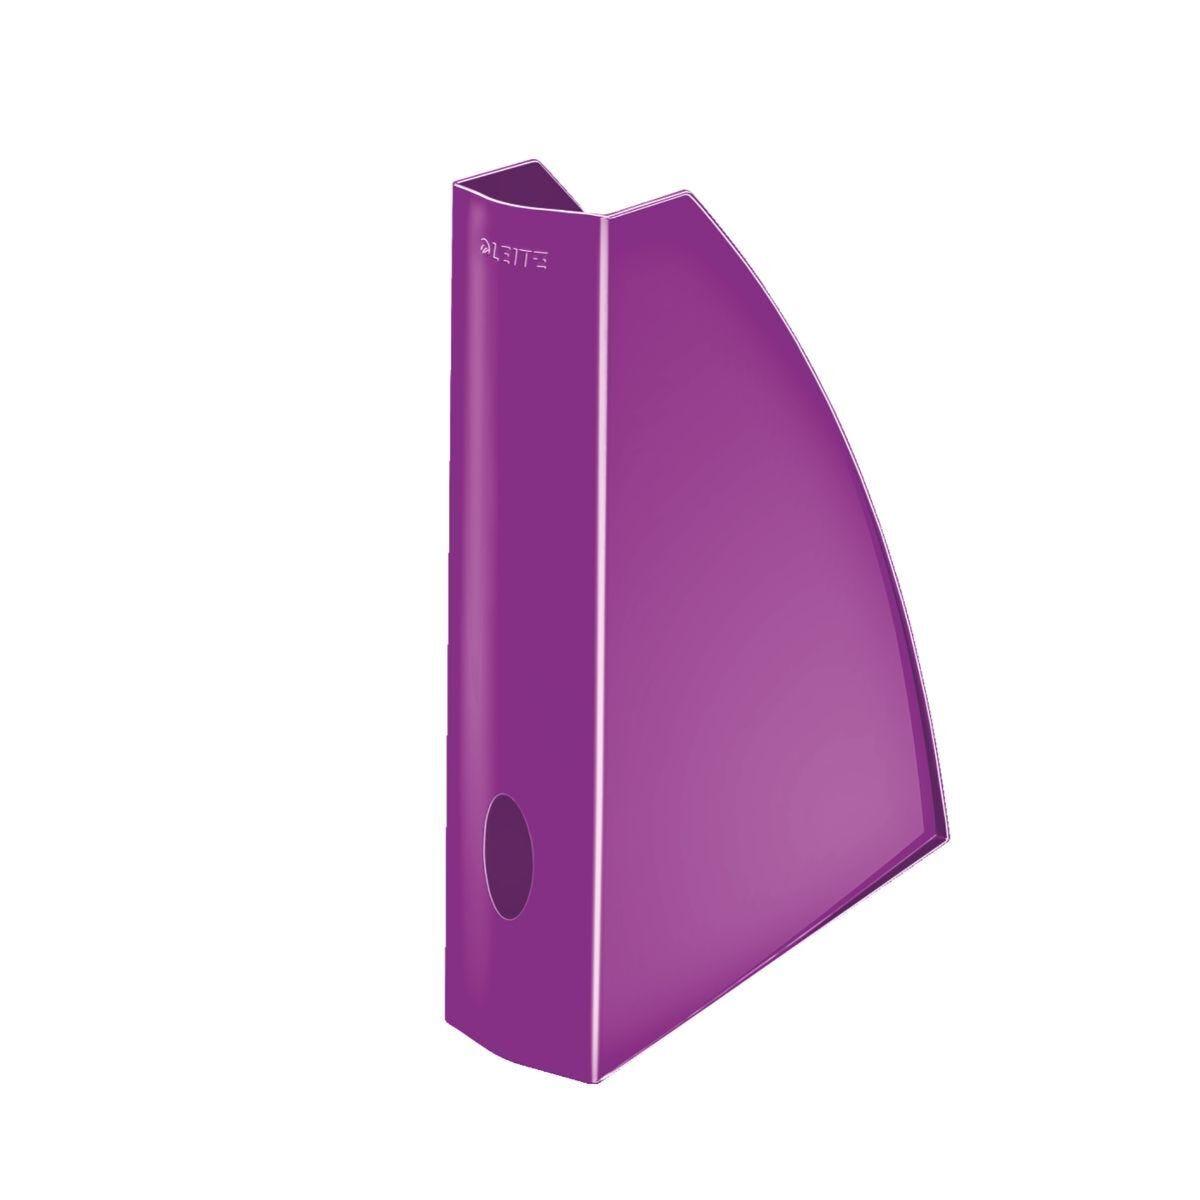 Leitz WOW Magazine File Purple